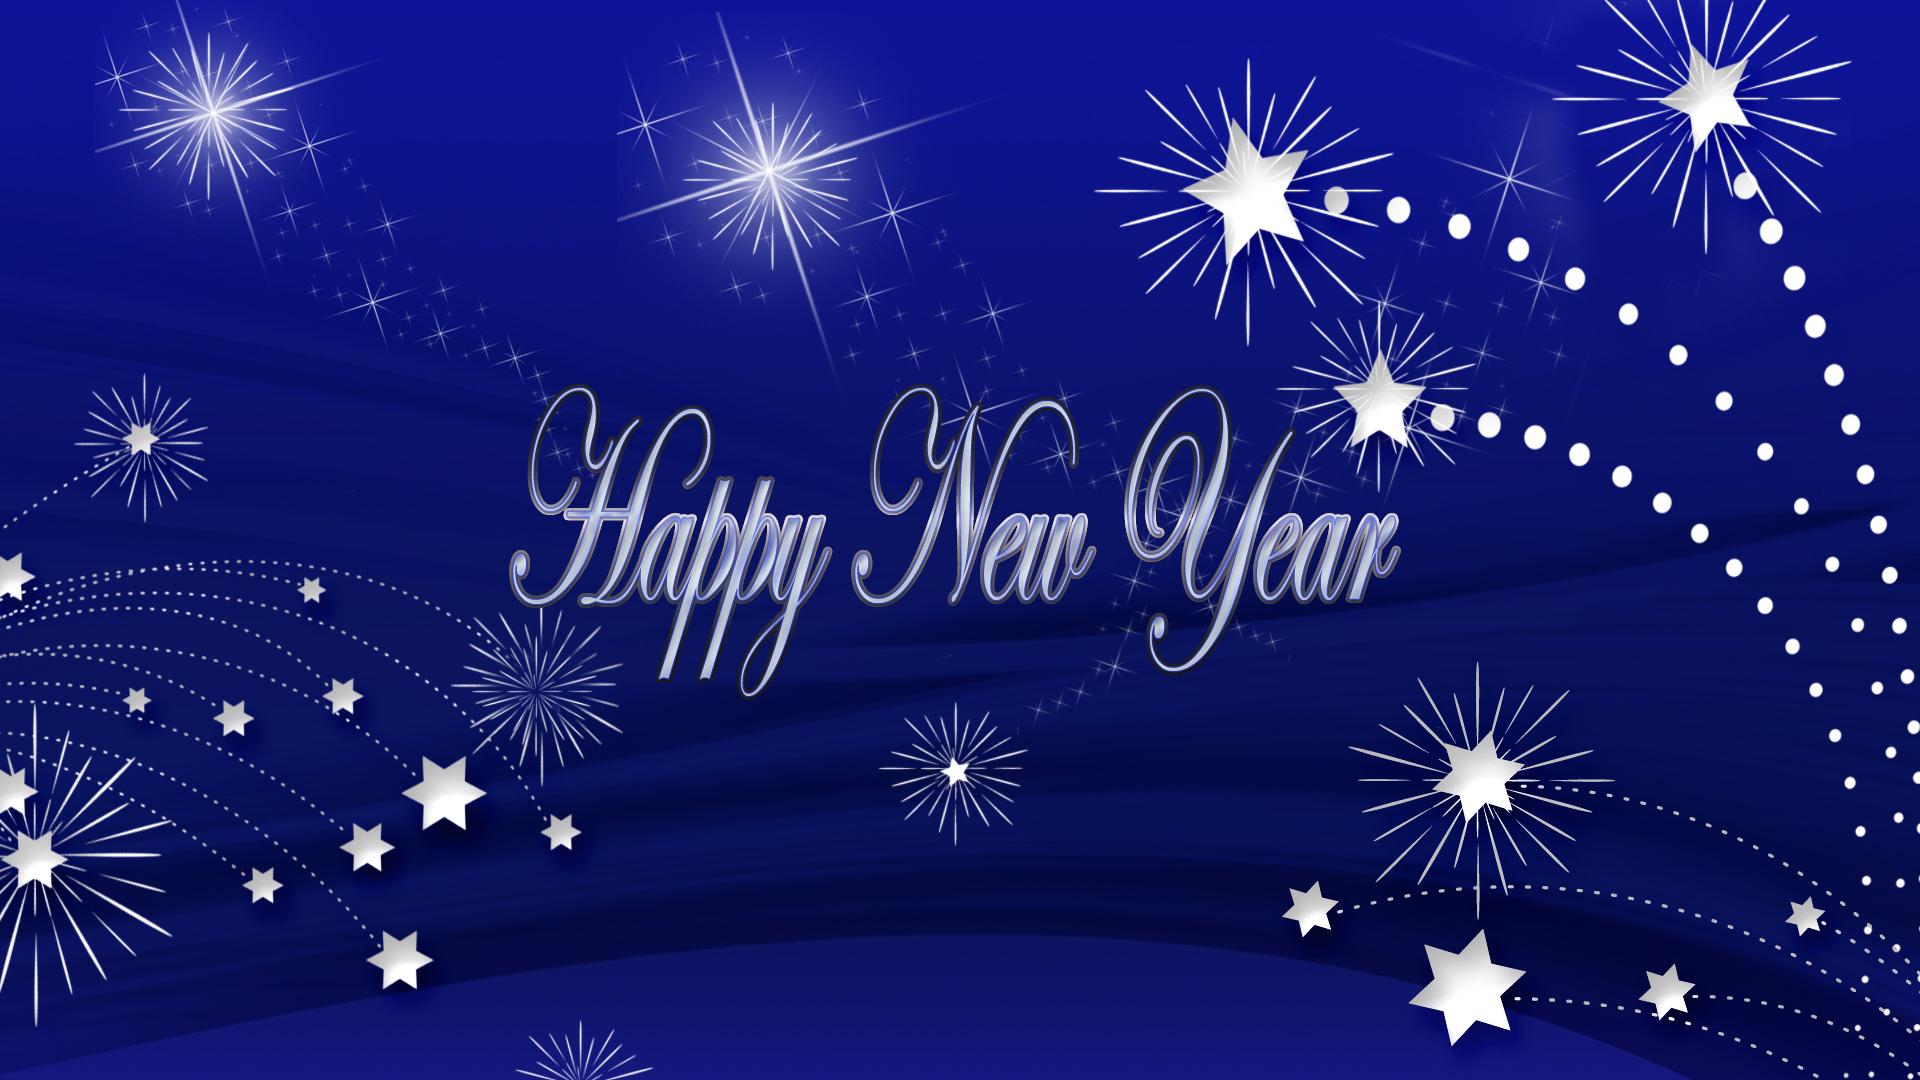 Happy New Year HD Wallpaper 2016 Download 1920x1080